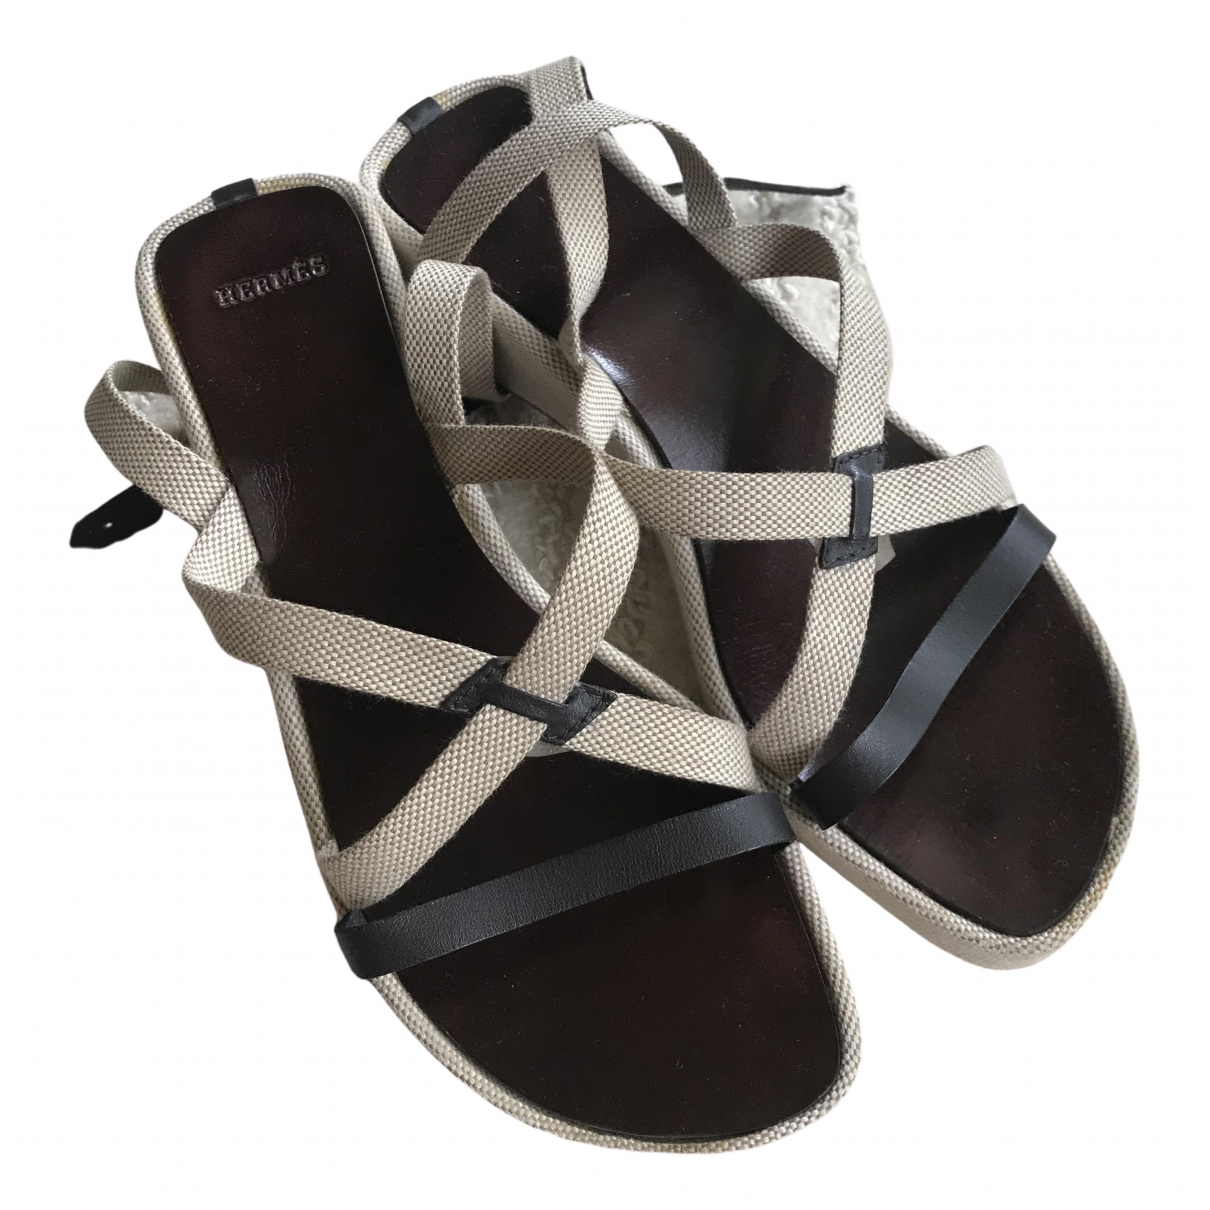 Hermès Santorini Beige Leather Sandals for Women 35 EU